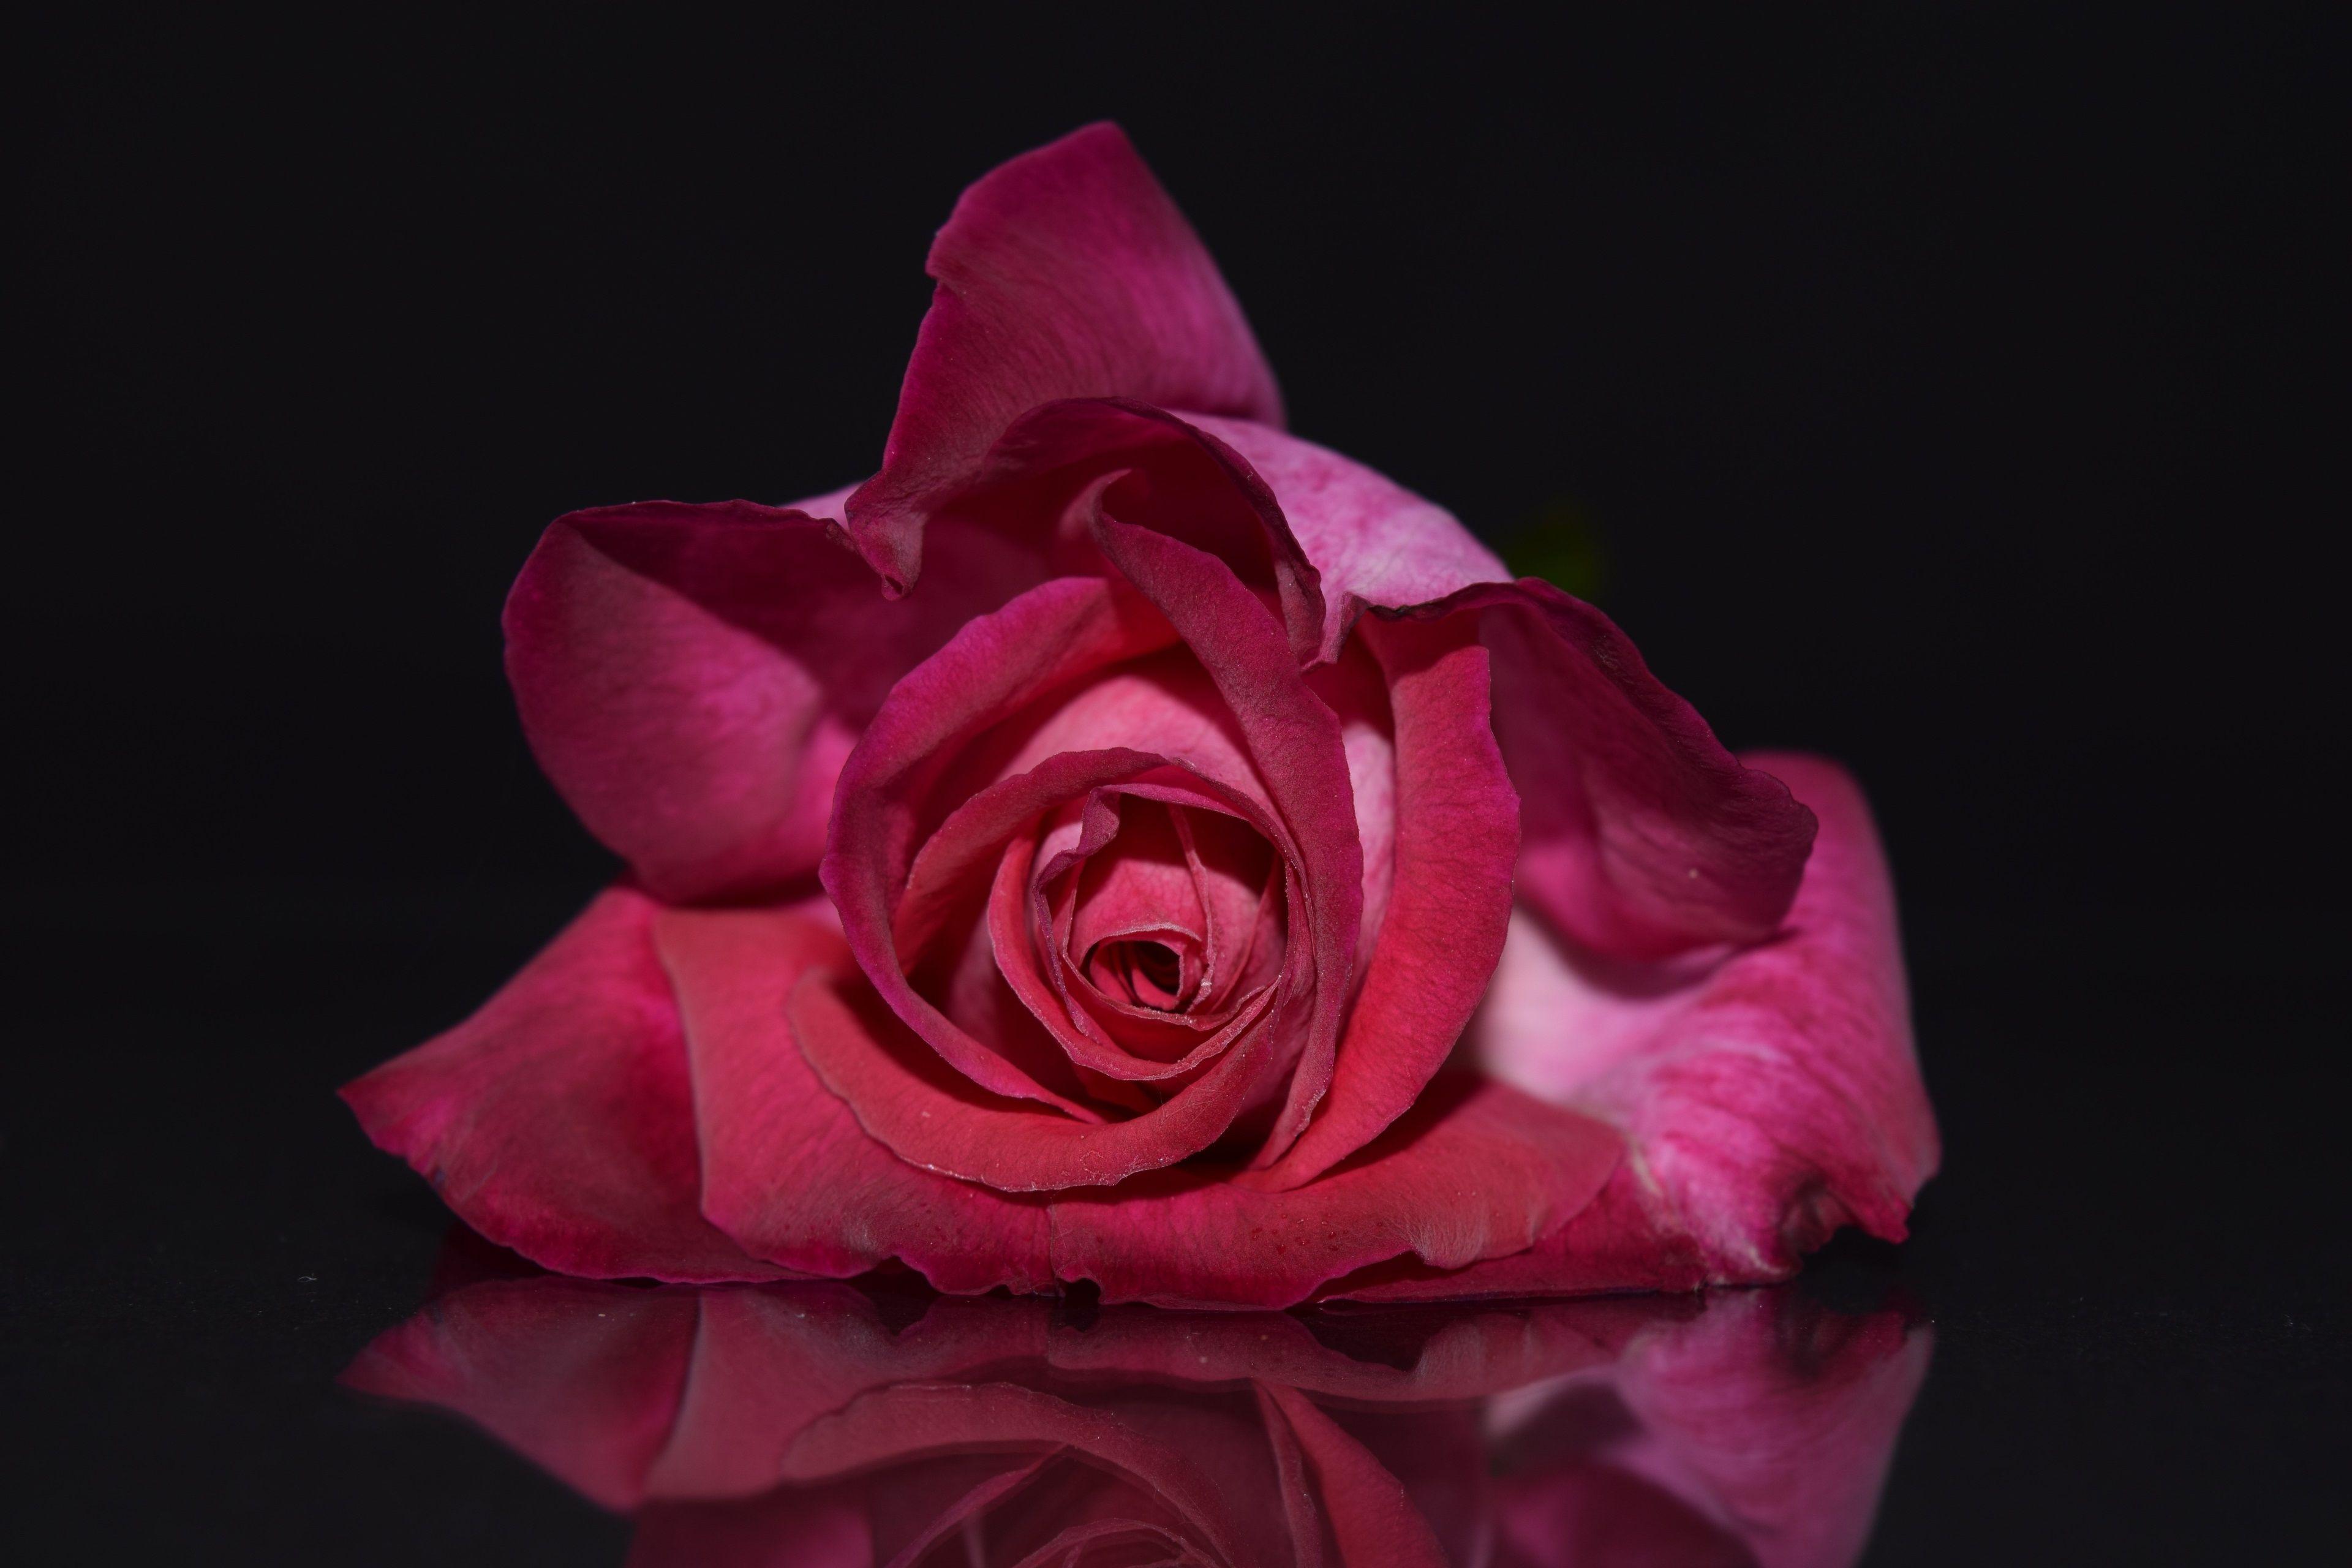 3840x2560 red rose 4k high quality wallpaper Розы